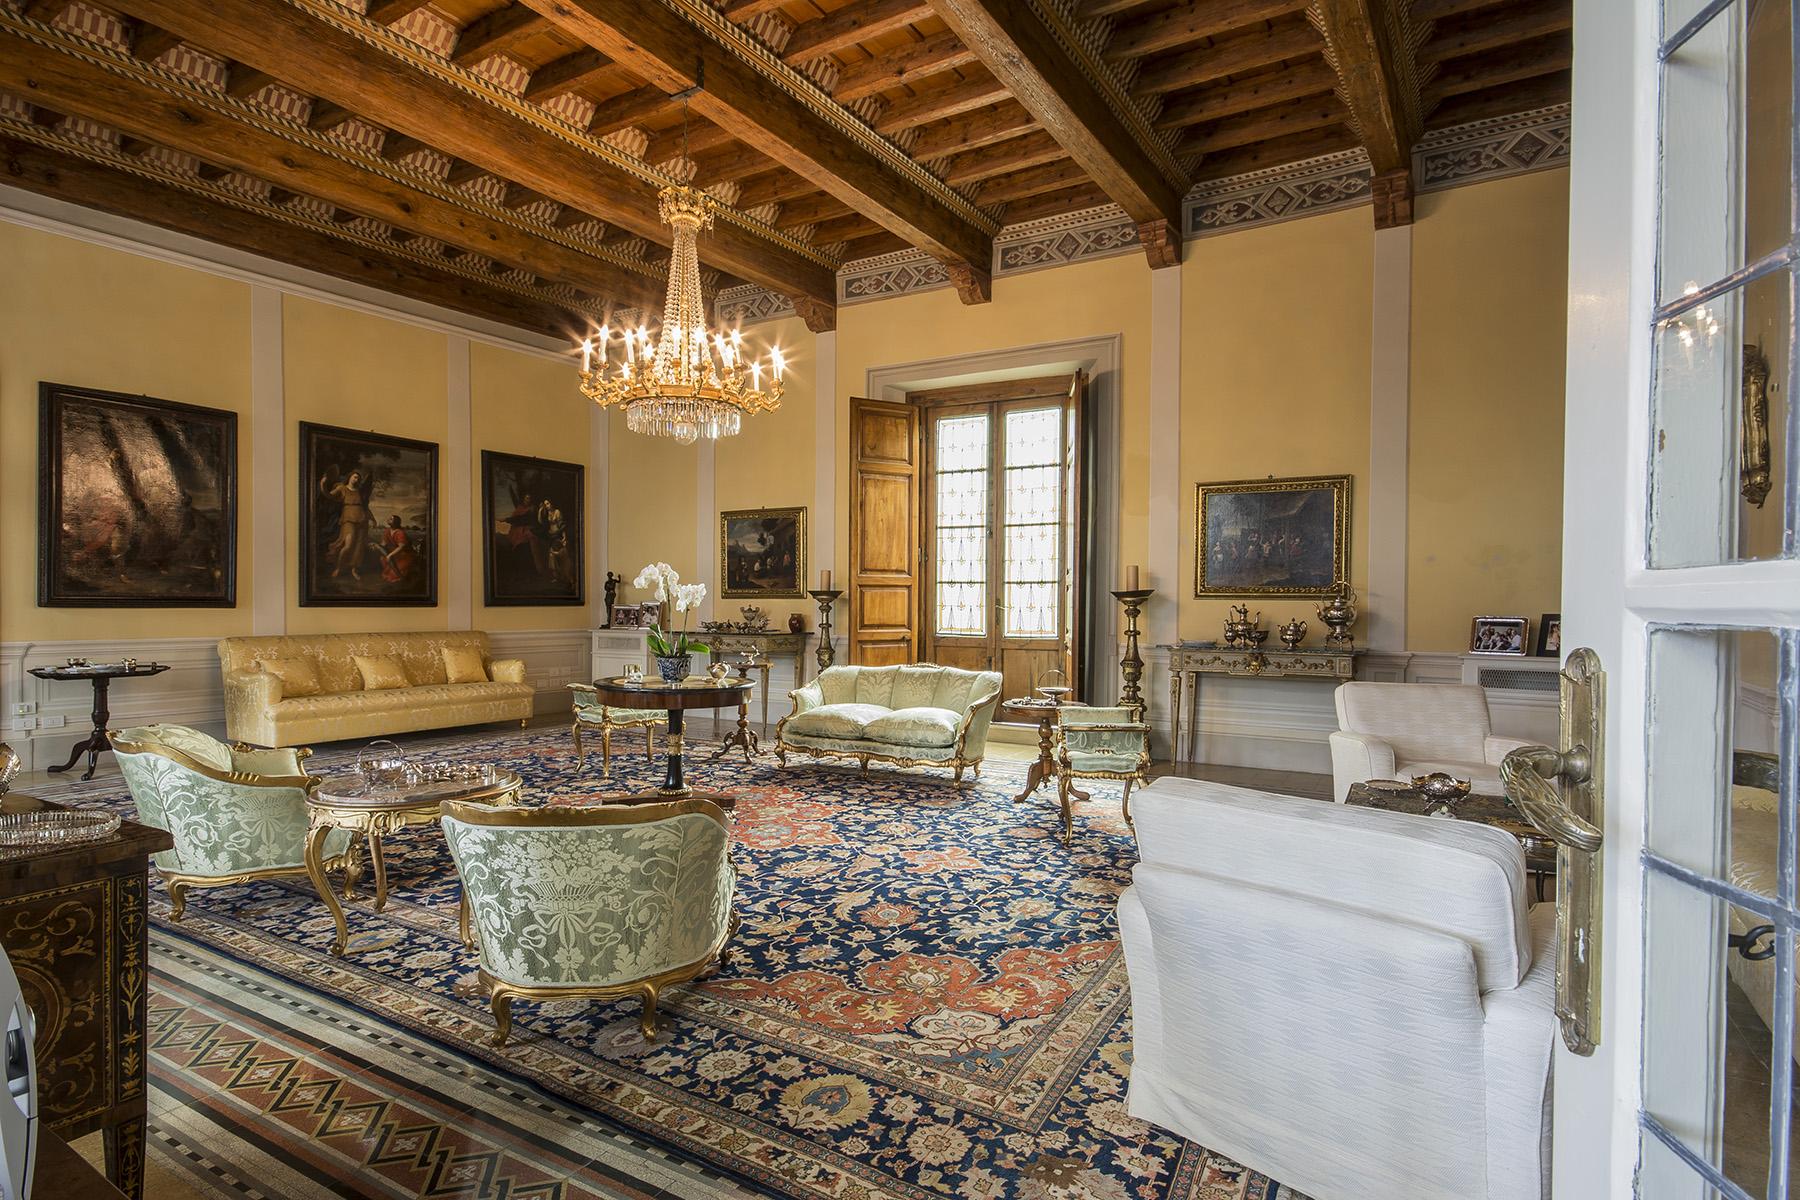 Villa in Vendita a Lucca: 5 locali, 1200 mq - Foto 2